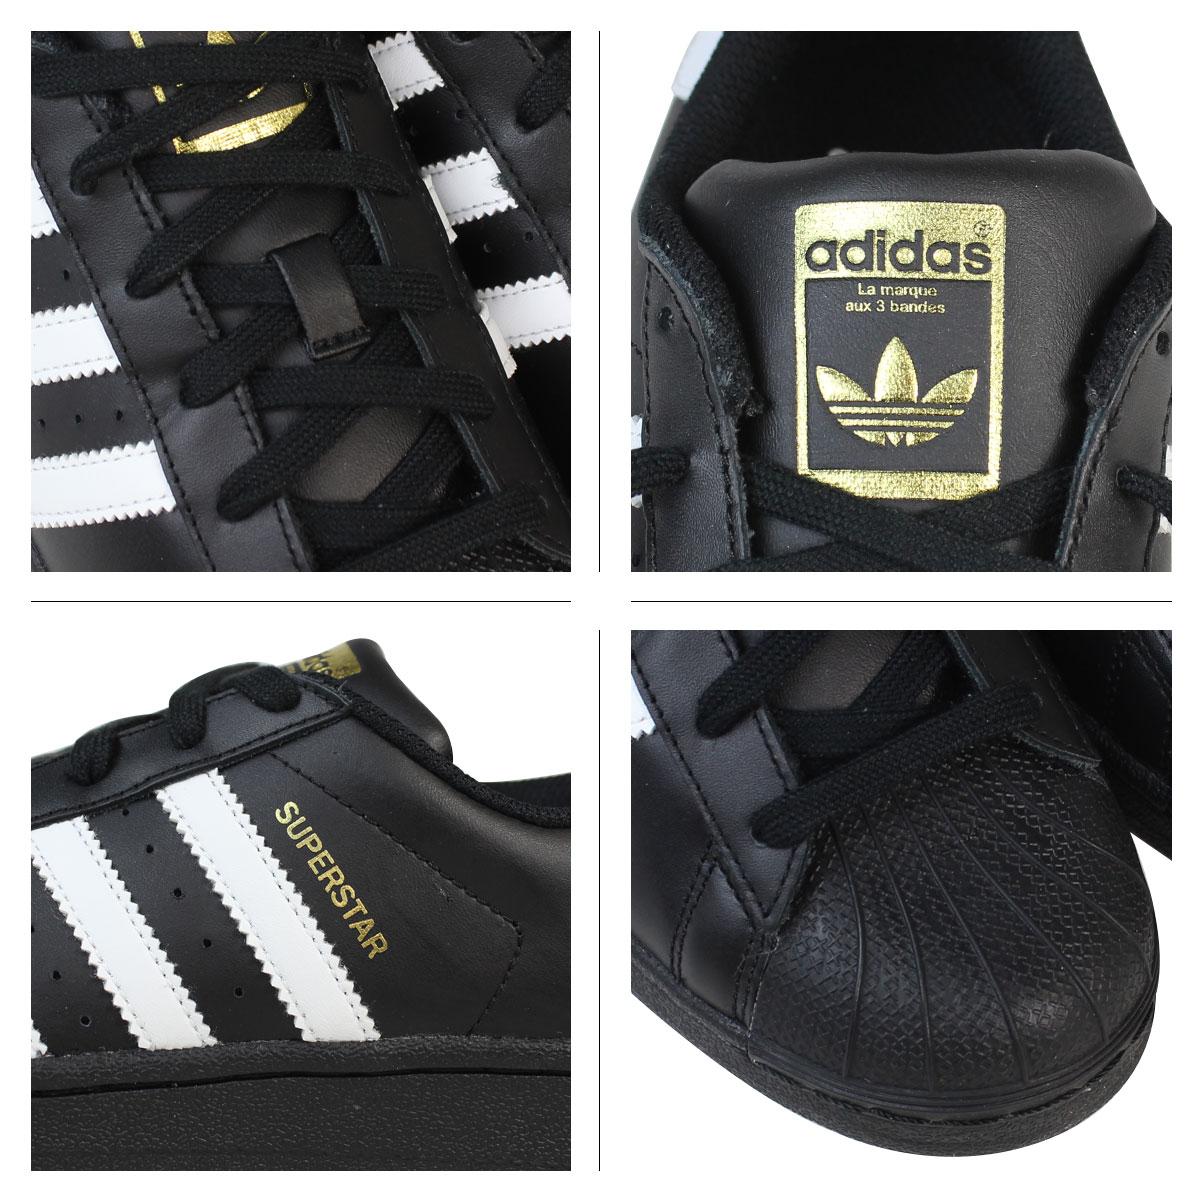 save off 4d1b7 04a22 Adidas originals adidas Originals Lady s SUPERSTAR FOUNDATION J sneakers  superstar foundation youth B23642 black